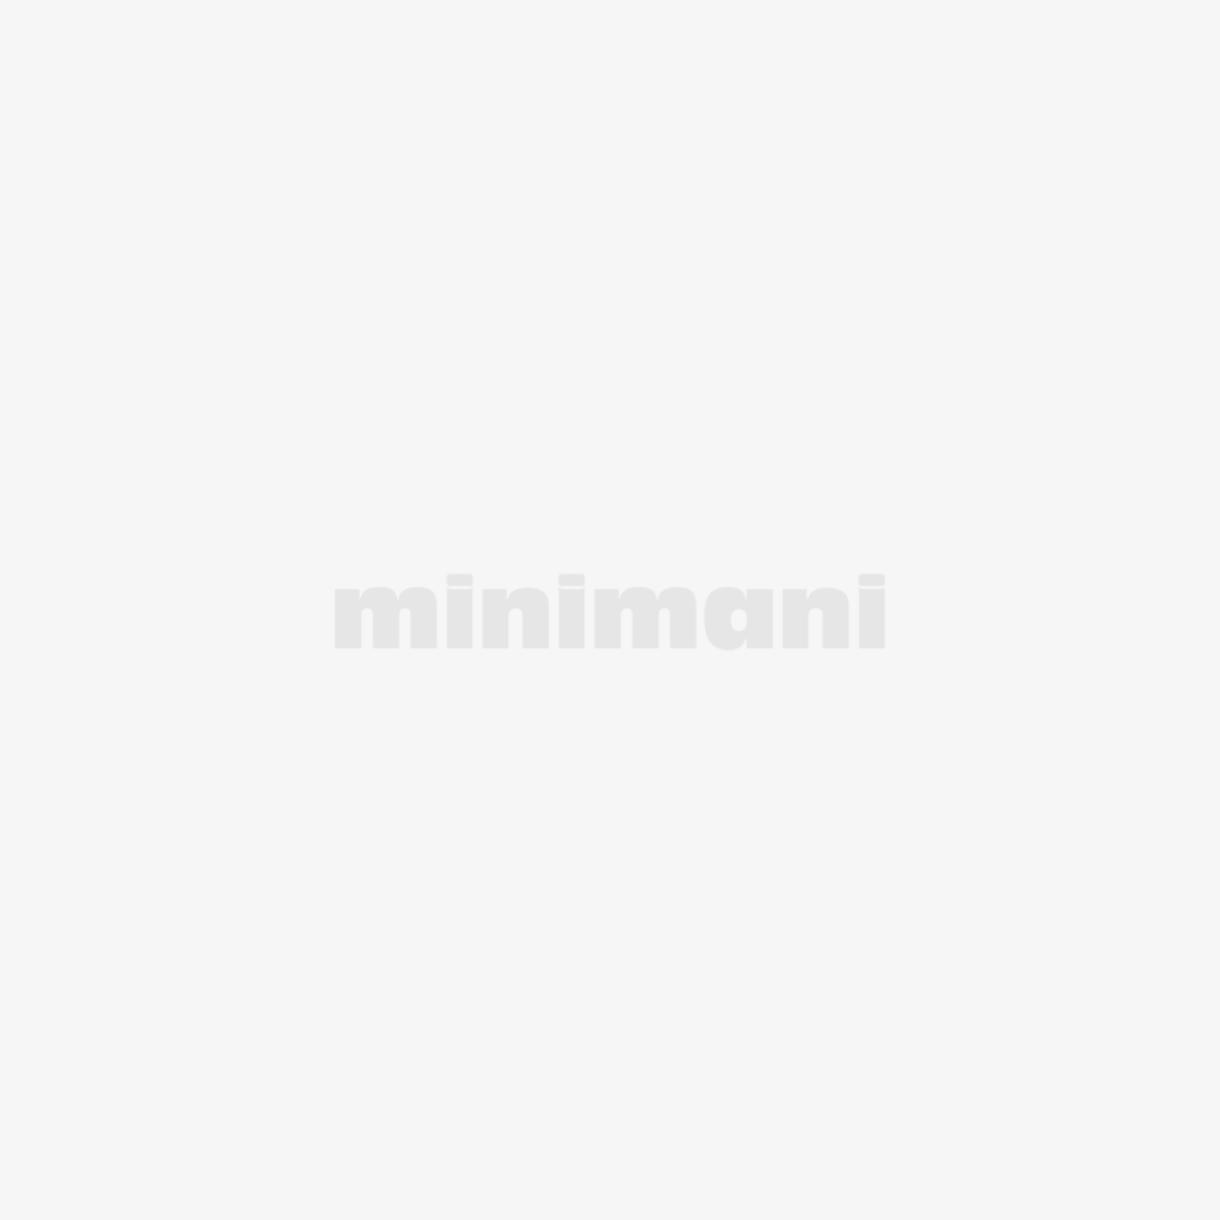 FINNLUMOR KOOTTAVA TÄHTI 3D 33CM 50MICRO-LED